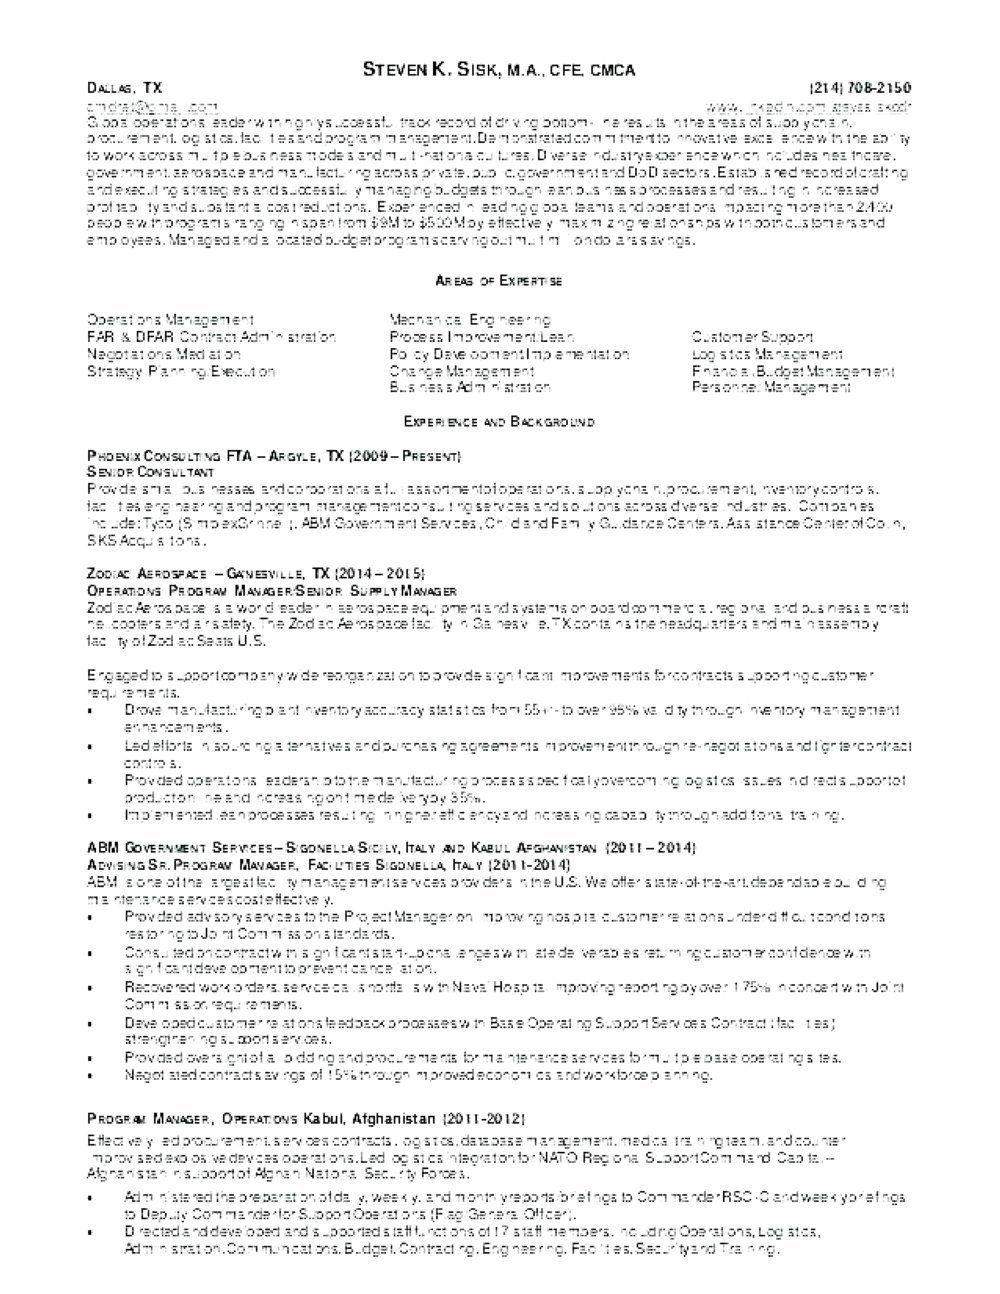 Accounts Payable Specialist Resume Inspirational Resume